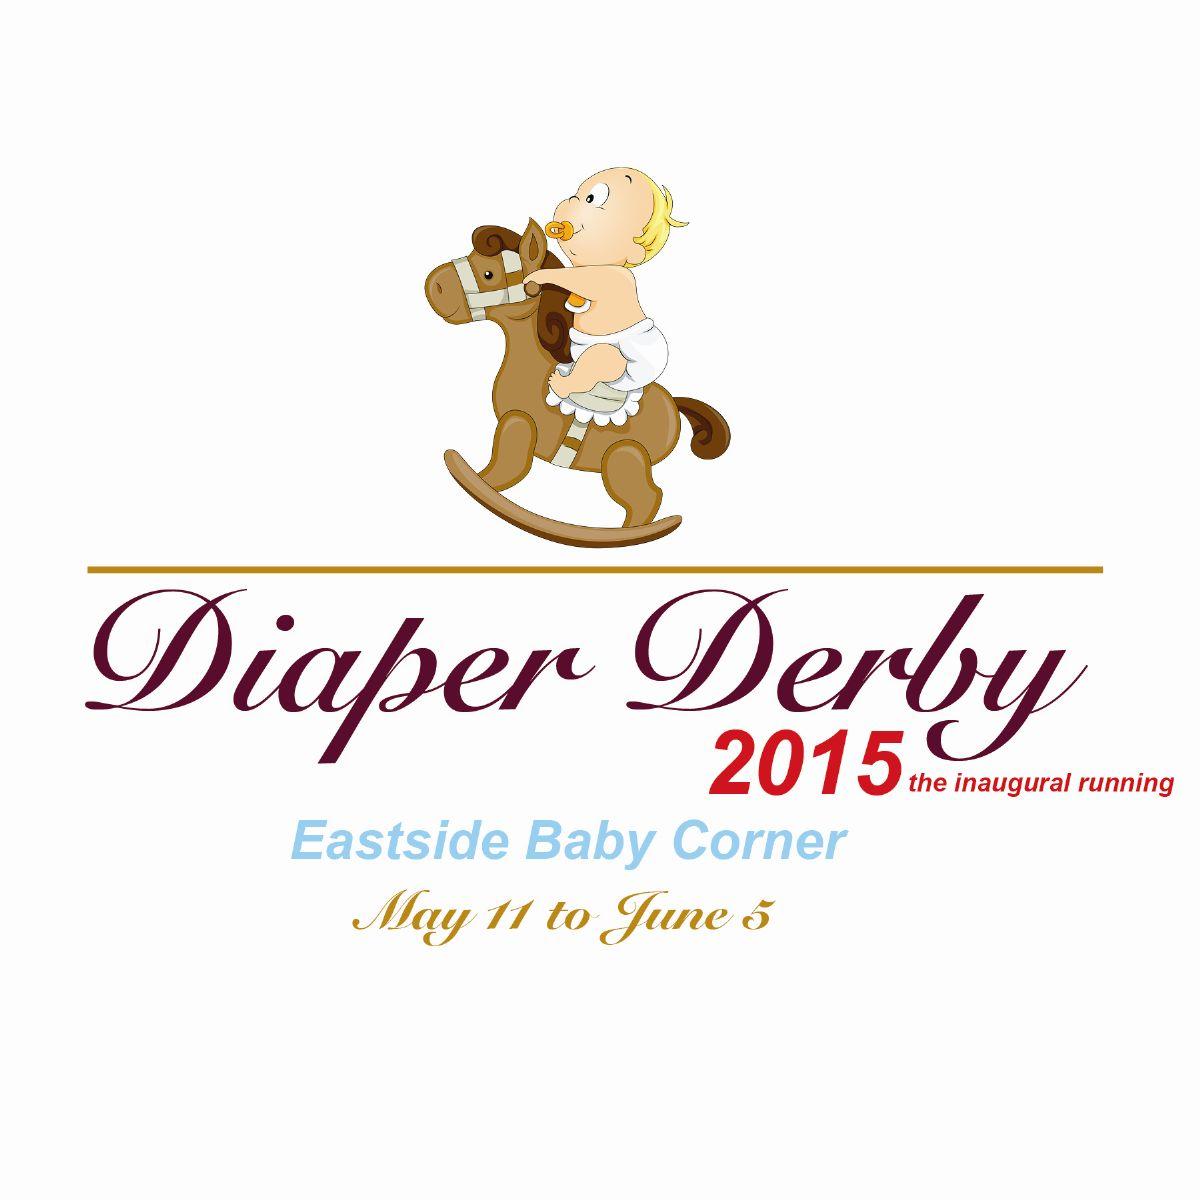 DiaperDerby2015logo